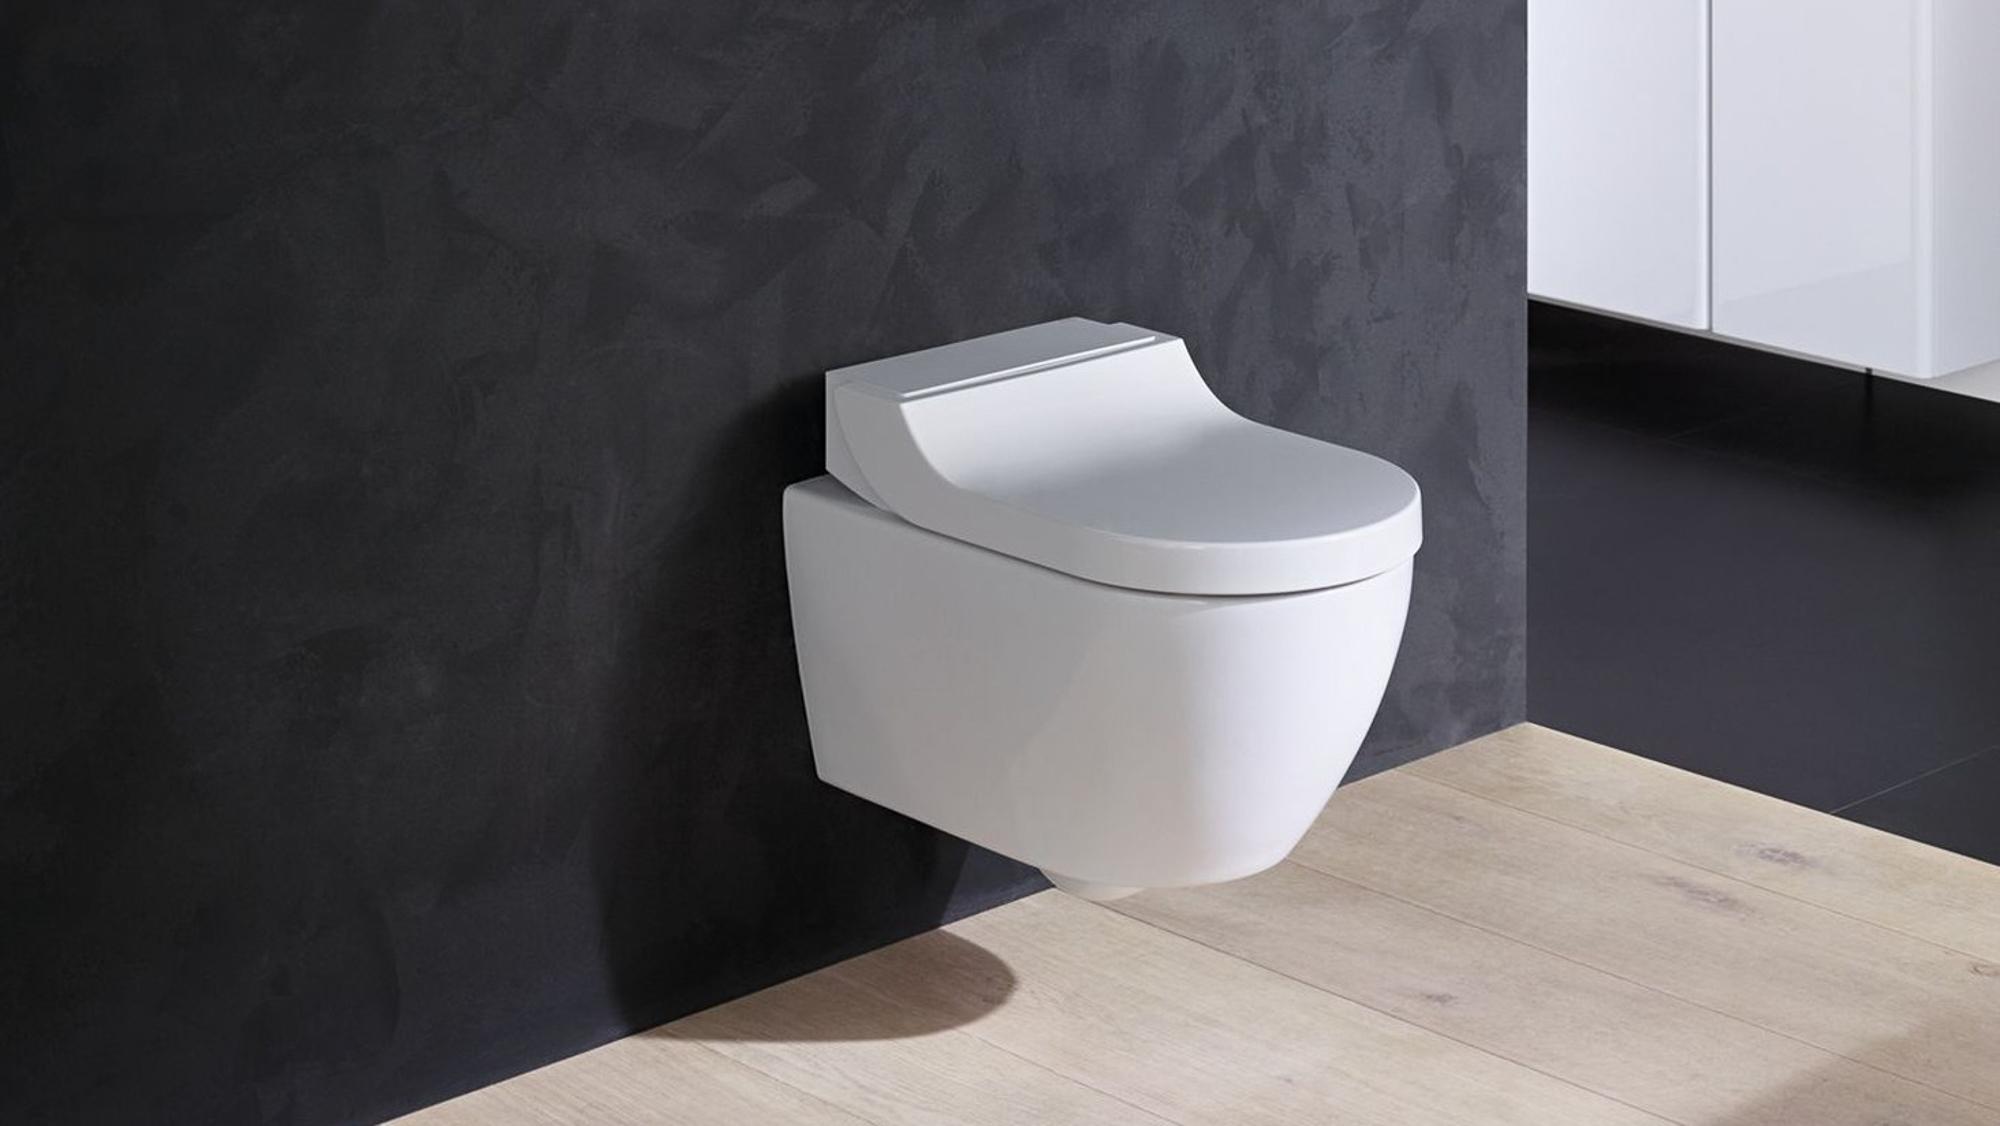 Fenneis_Dusch-WC